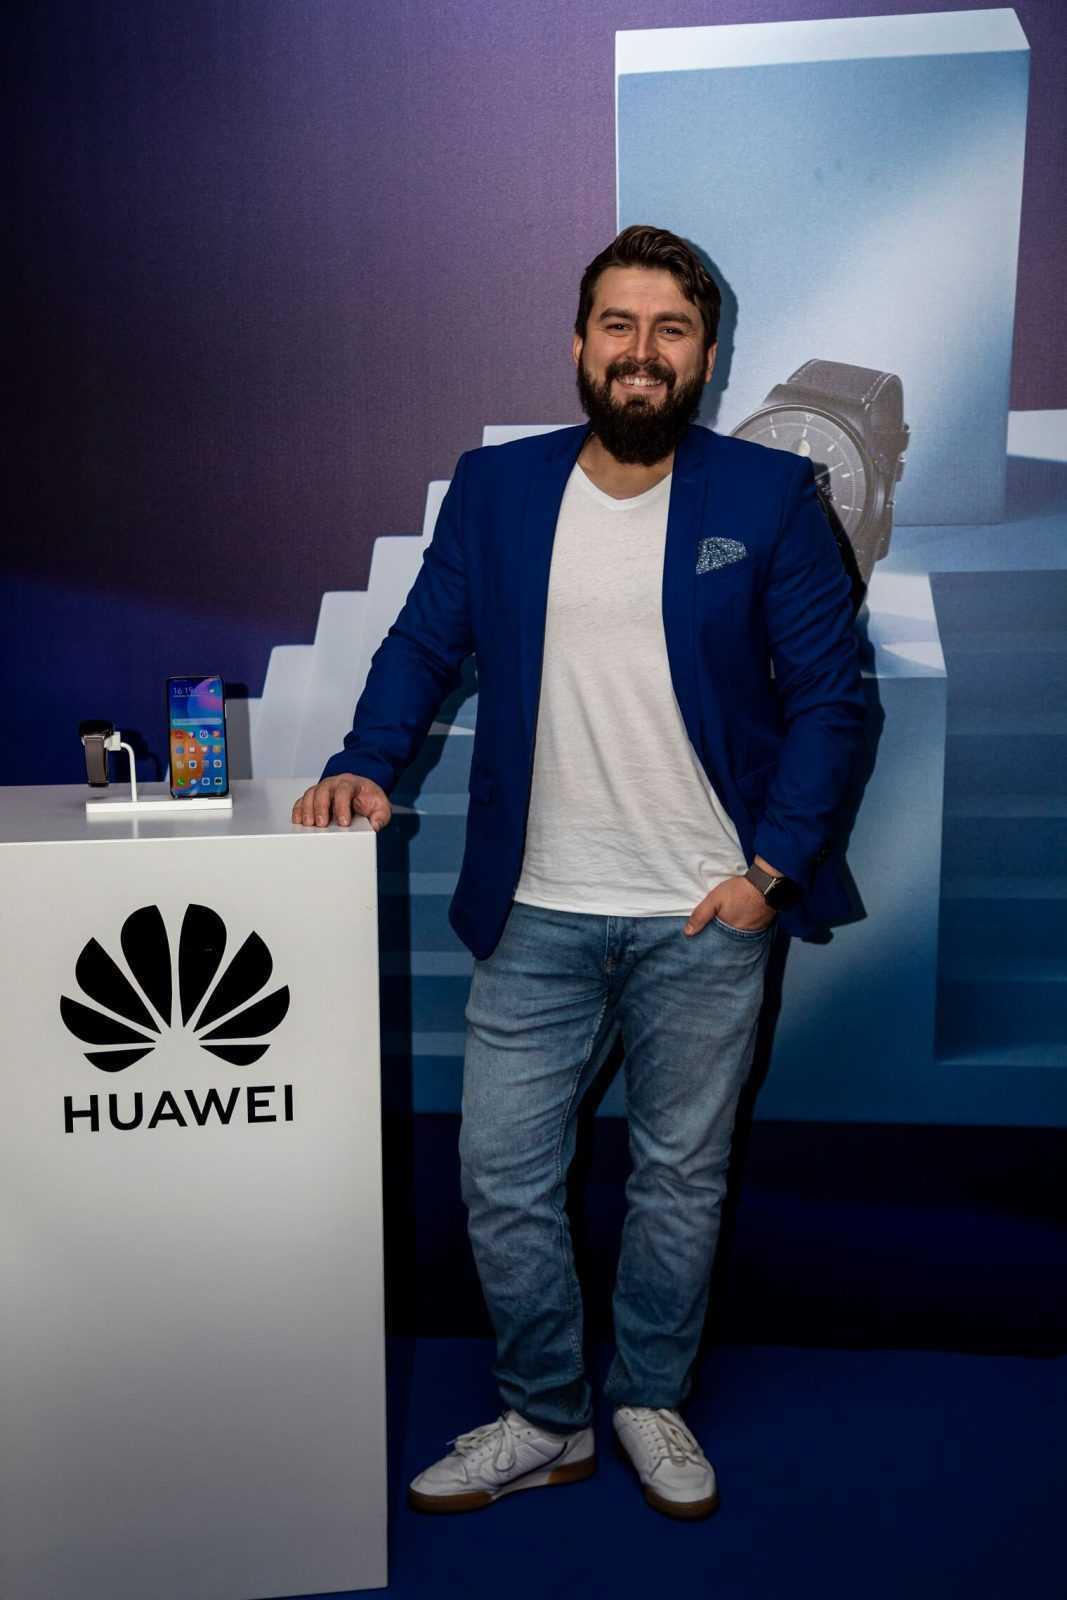 Huawei prezentacija un modes skate (1)